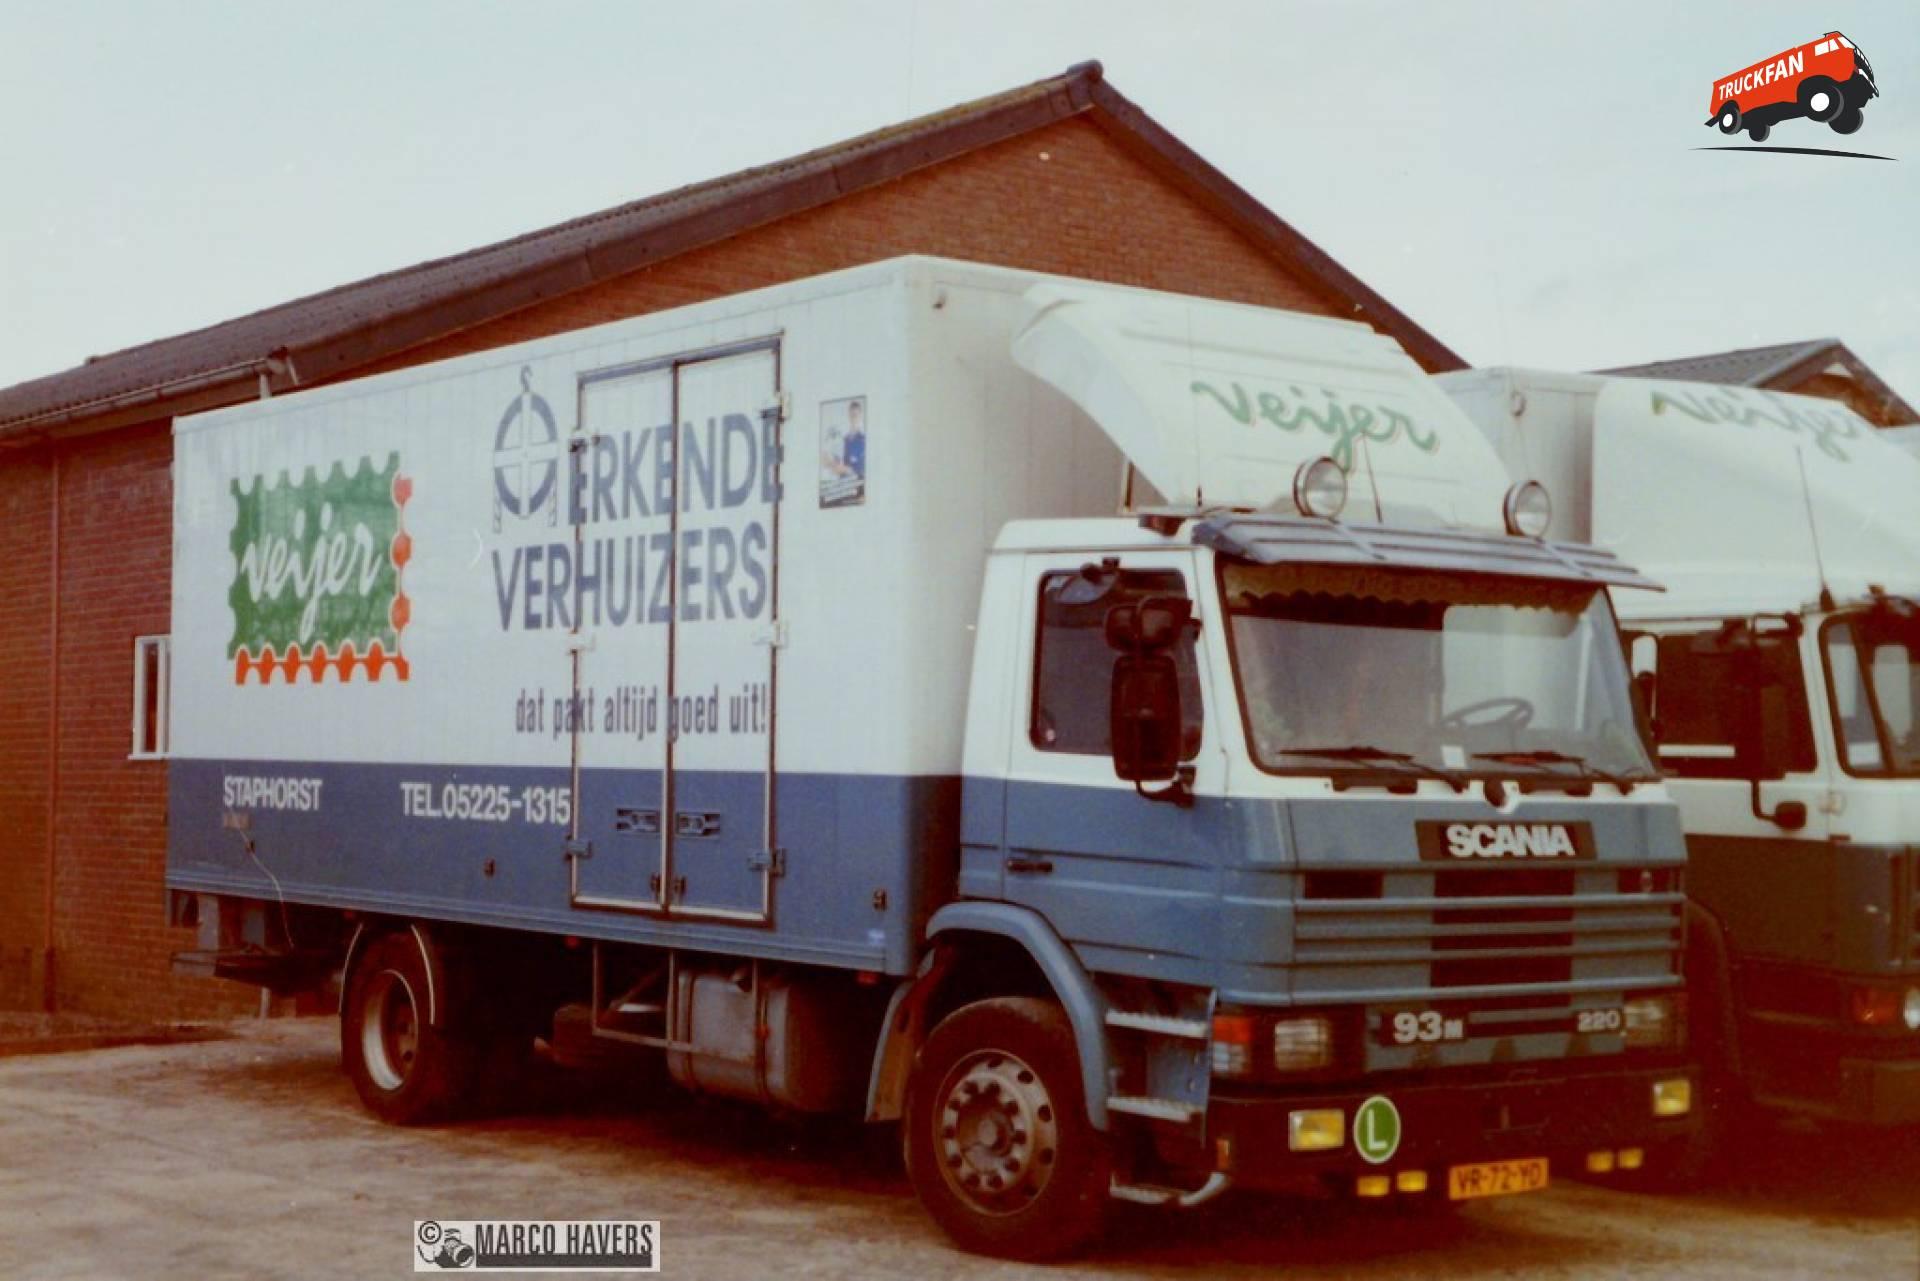 Scania 93